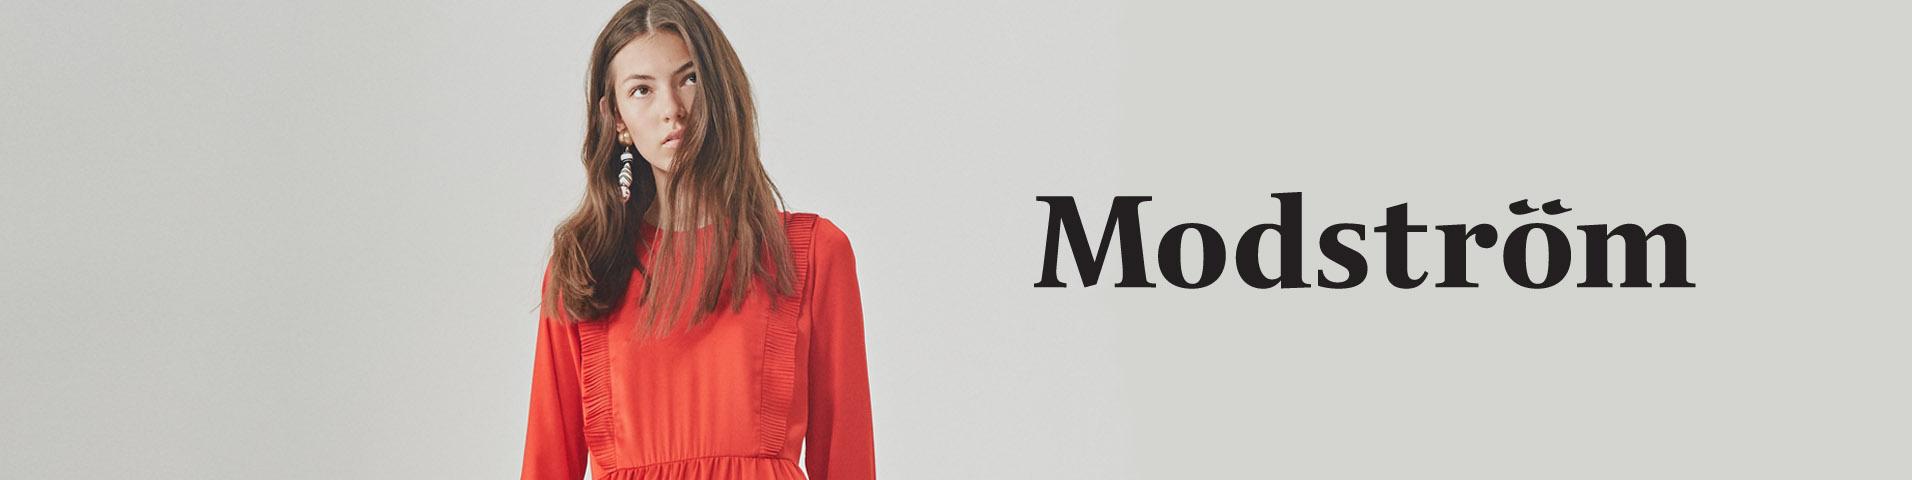 76beecf2186 Modström online shop | Gratis verzending | ZALANDO